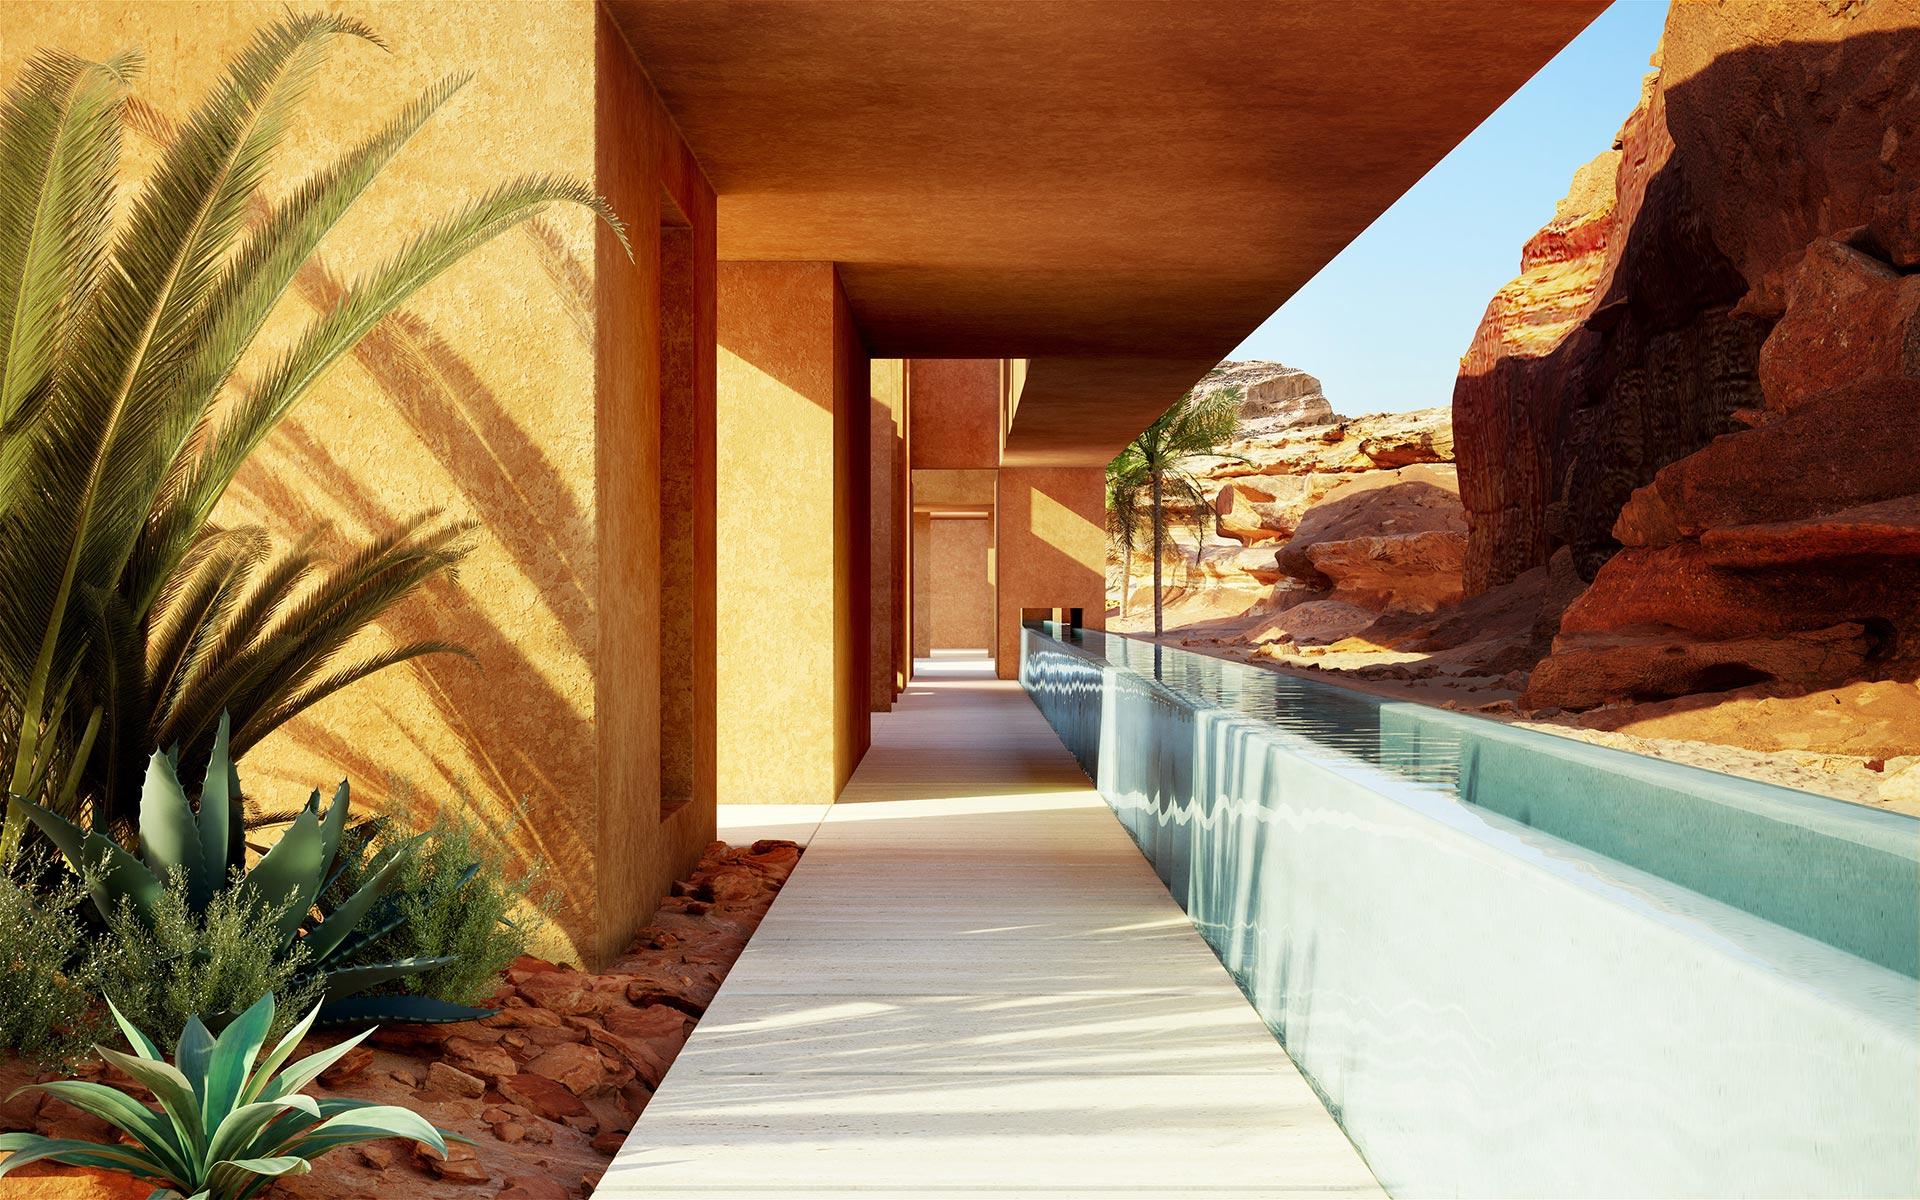 3D Photo of a villa exterior hallway in Morocco